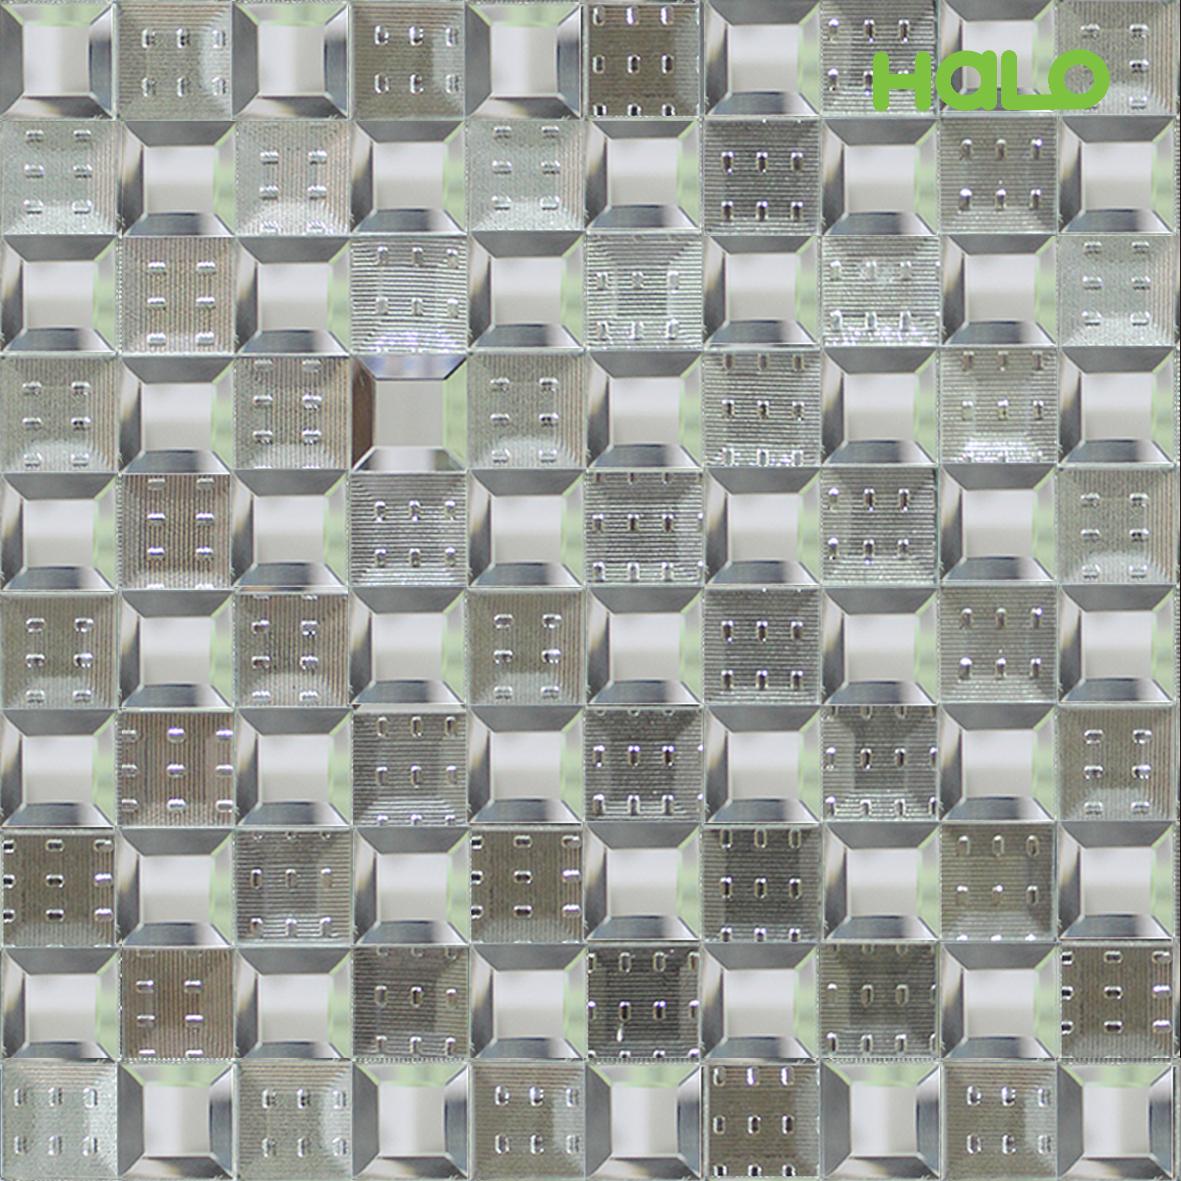 Gạch mosaic thủy tinh - Y30JJP04A